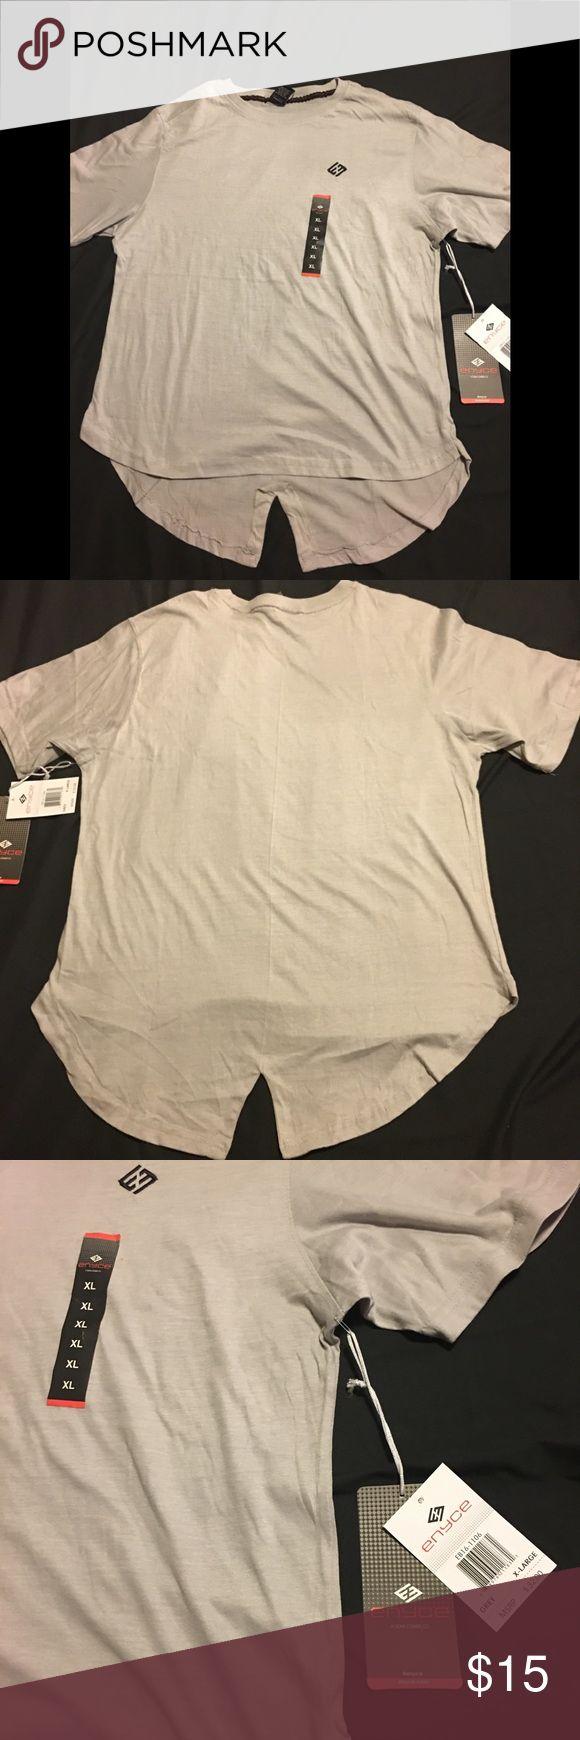 ENYCE Sean Combs co. Men's shirt ENYCE Sean Comb Co. men's shirt Lt grey color soft ENYCE Sean Comb Co. Shirts Tees - Short Sleeve